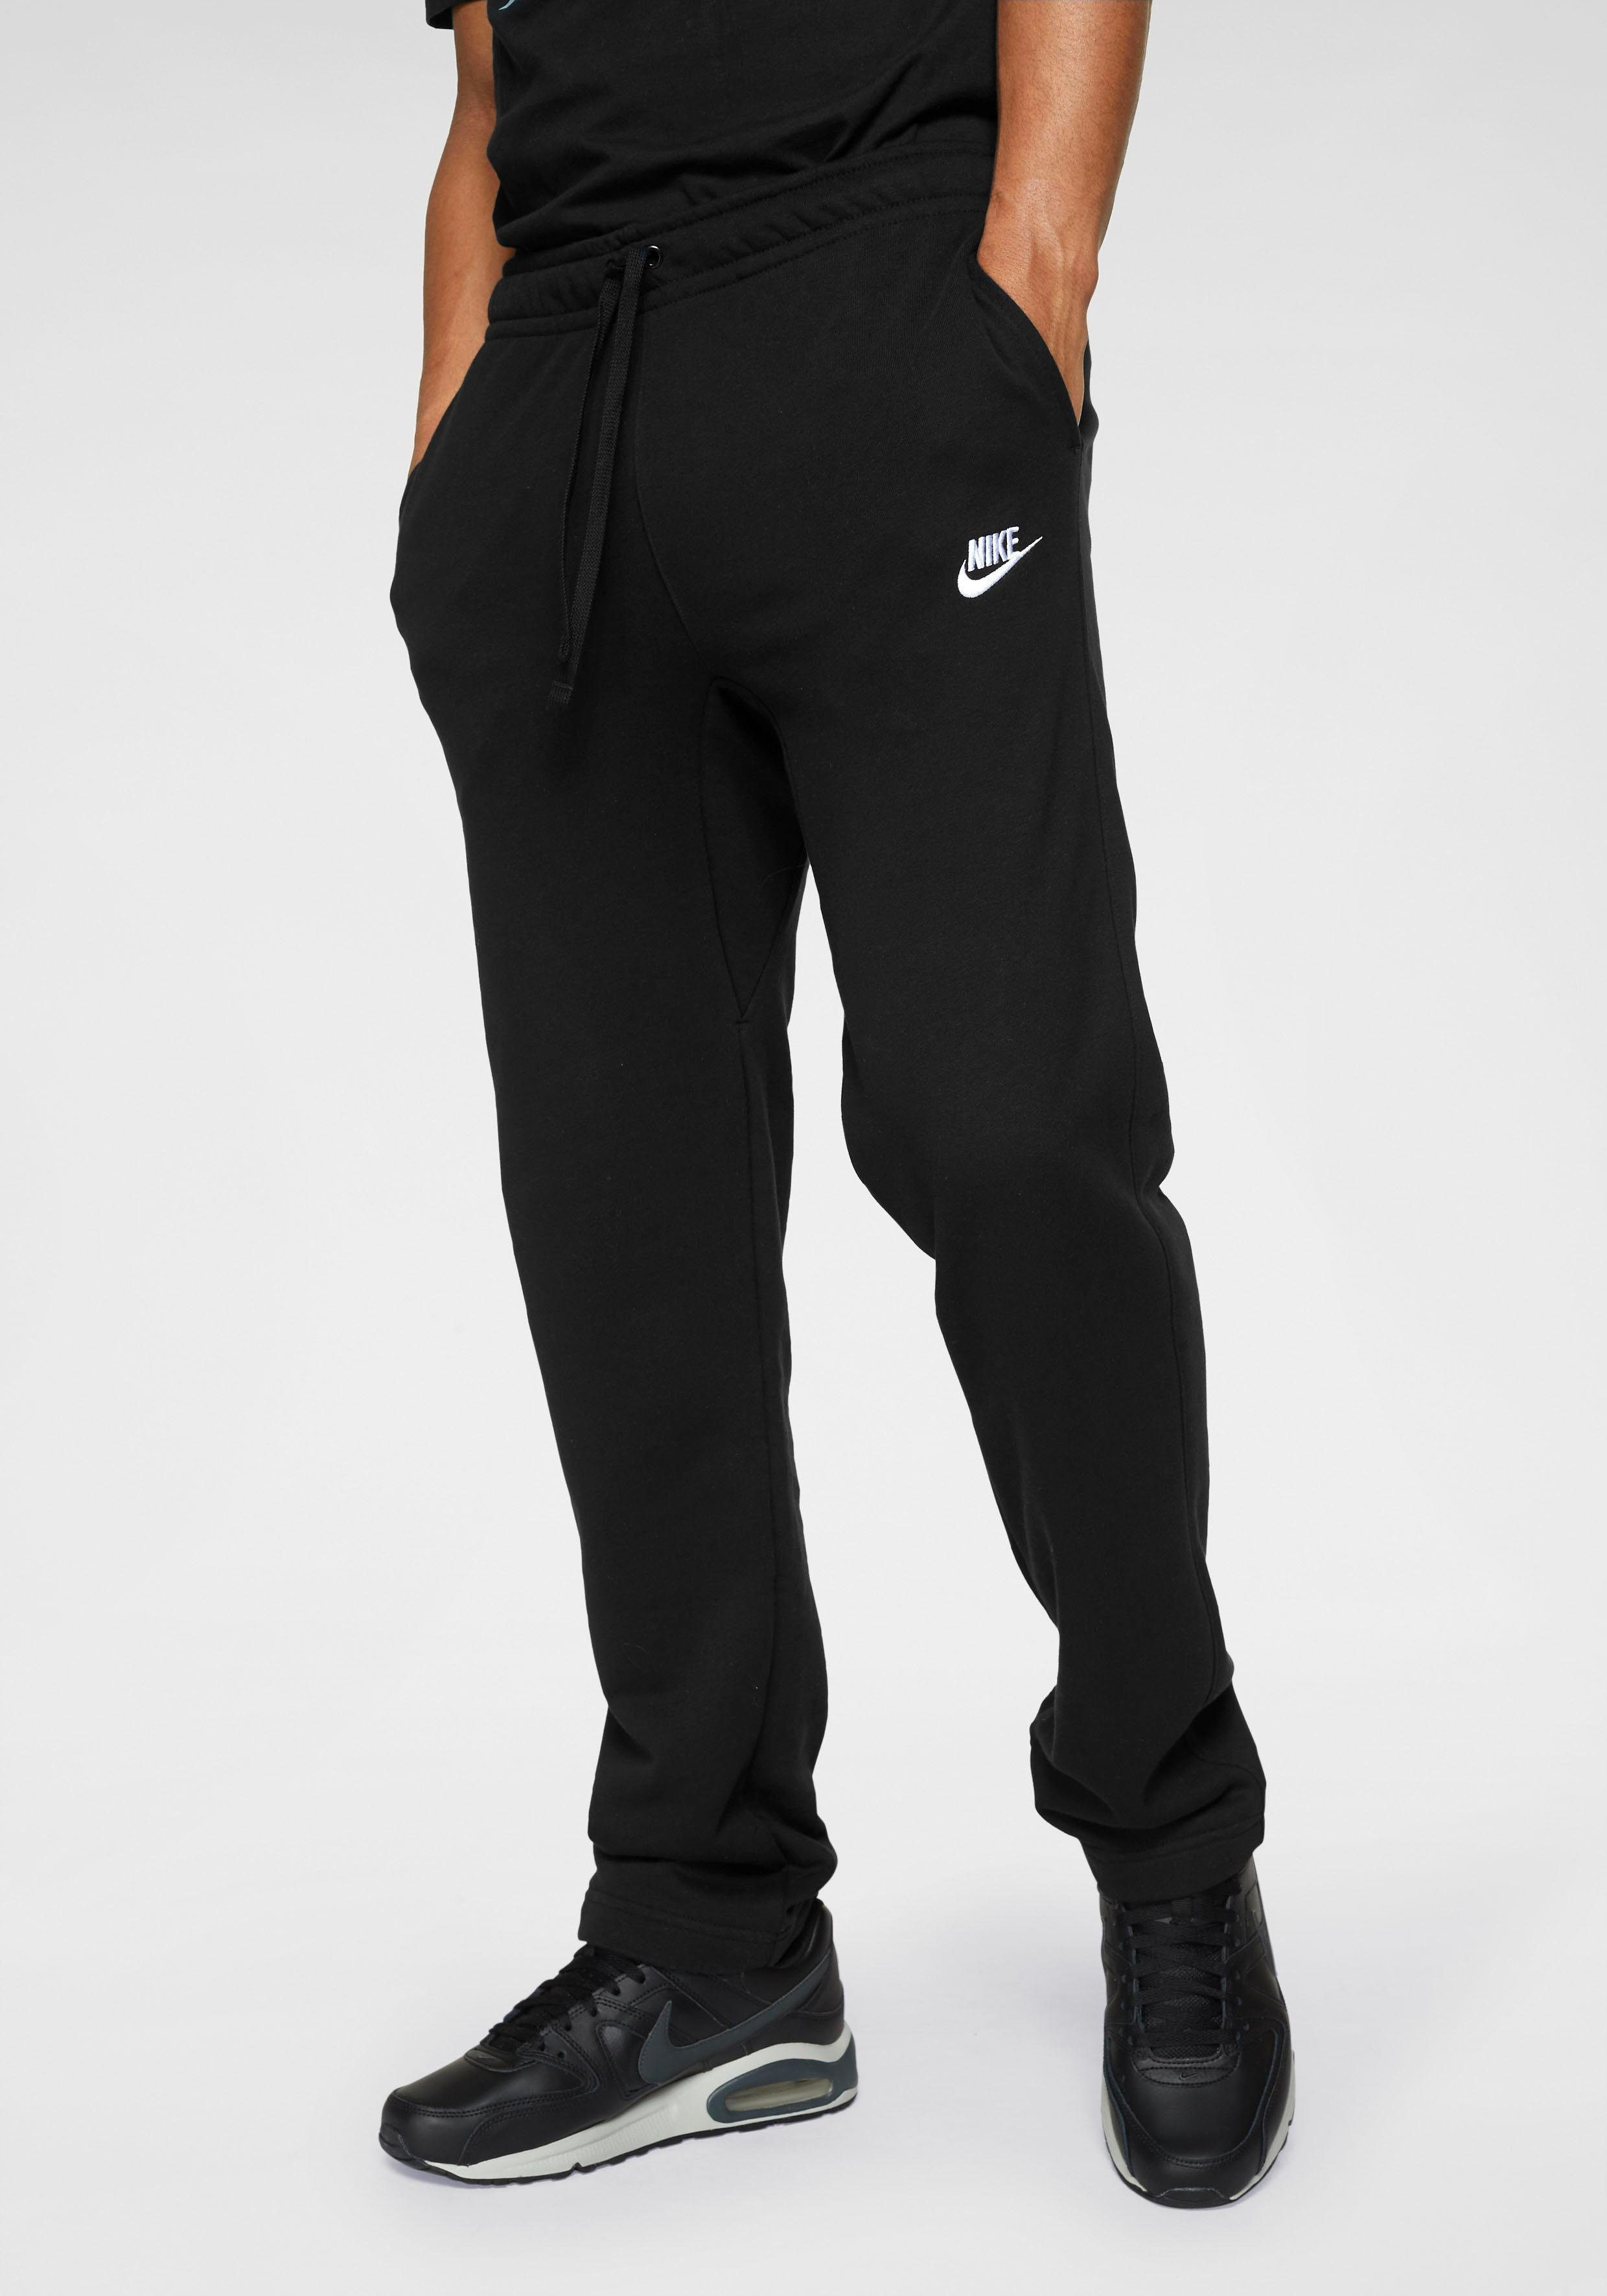 Nike Sportswear Jogginghose »M NSW CLUB PANT OH FT« online kaufen | OTTO